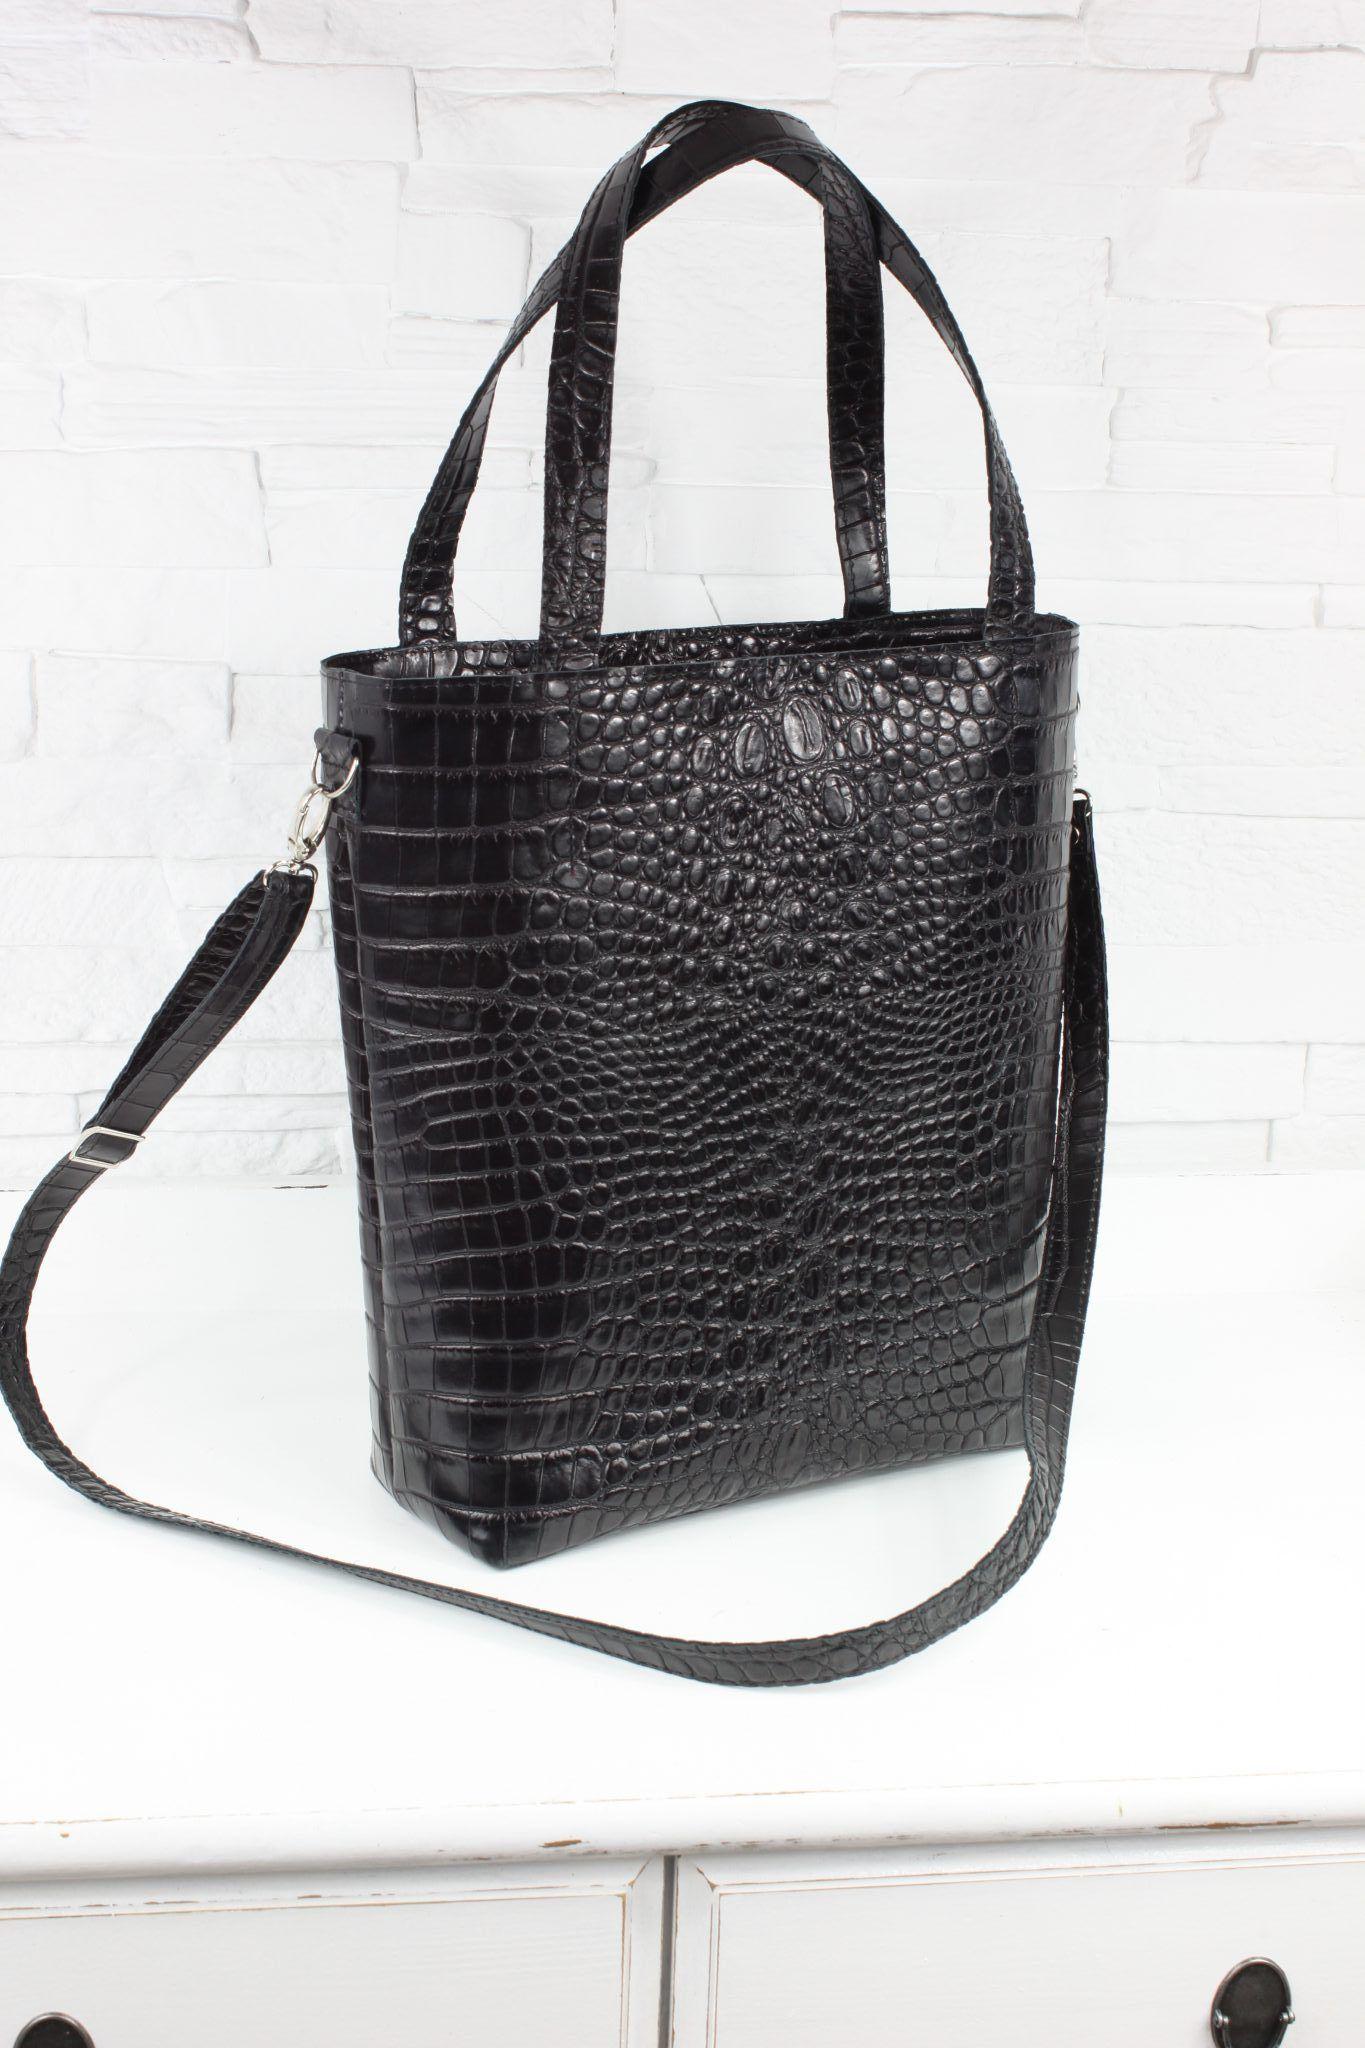 d73763518a3bb Torebka skórzana - Shopper Verona czarny krokodyl L d - Torebki Fabiola -  sklep internetowy z torebkami